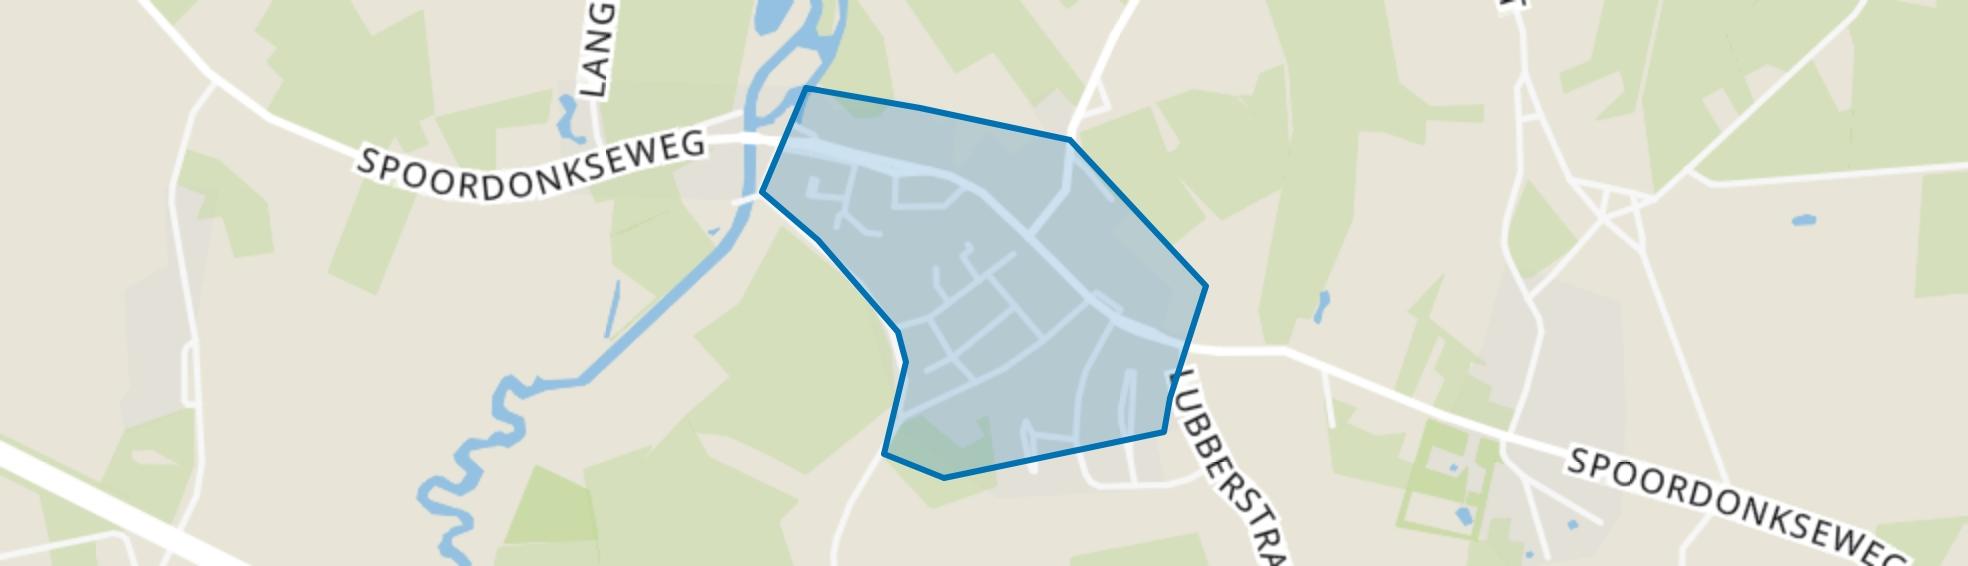 Spoordonk, Oirschot map